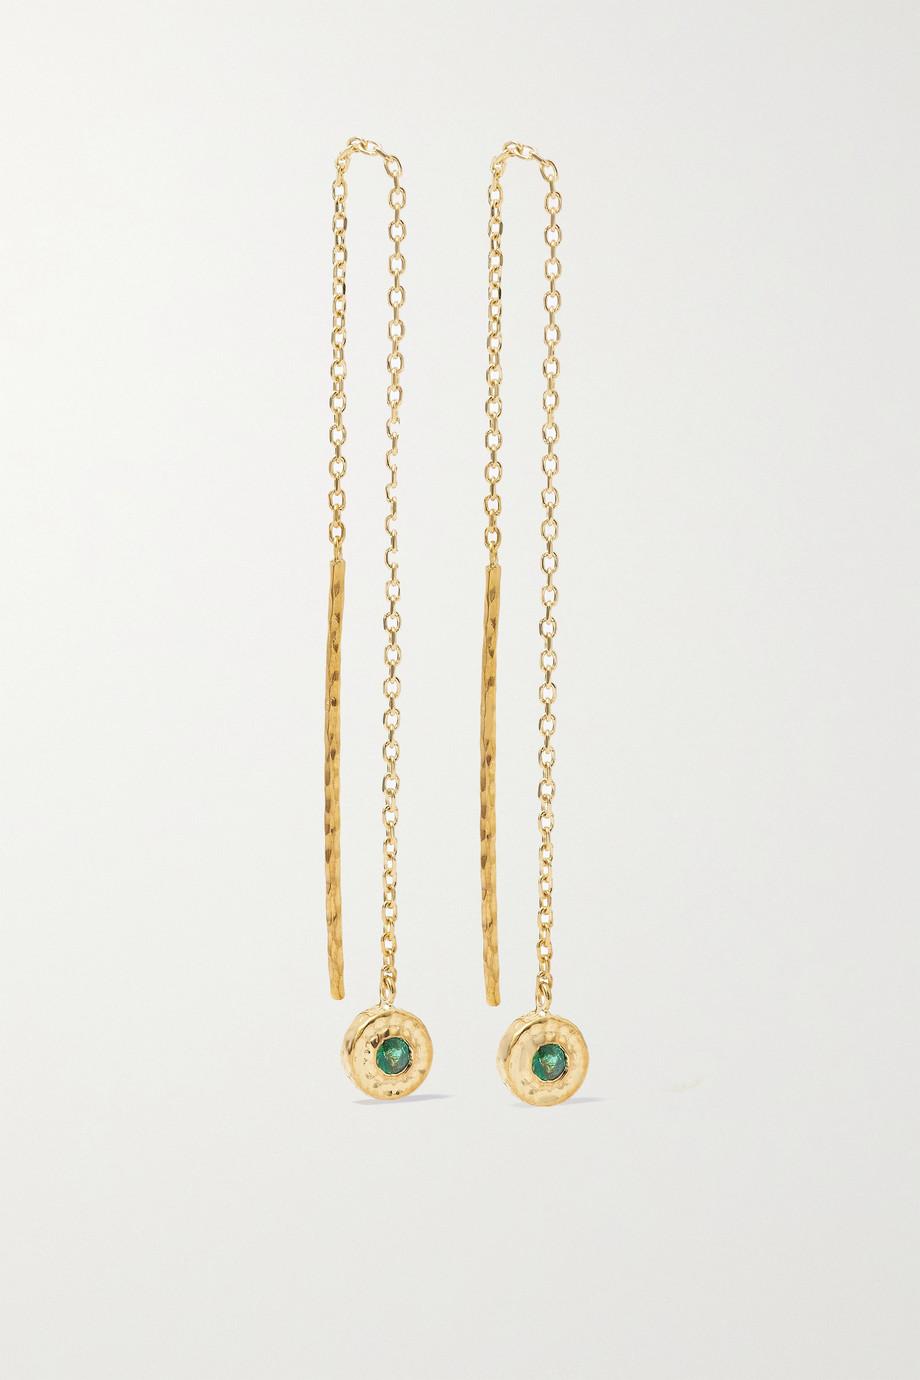 Octavia Elizabeth + NET SUSTAIN Nesting Gem 18-karat recycled gold emerald earrings